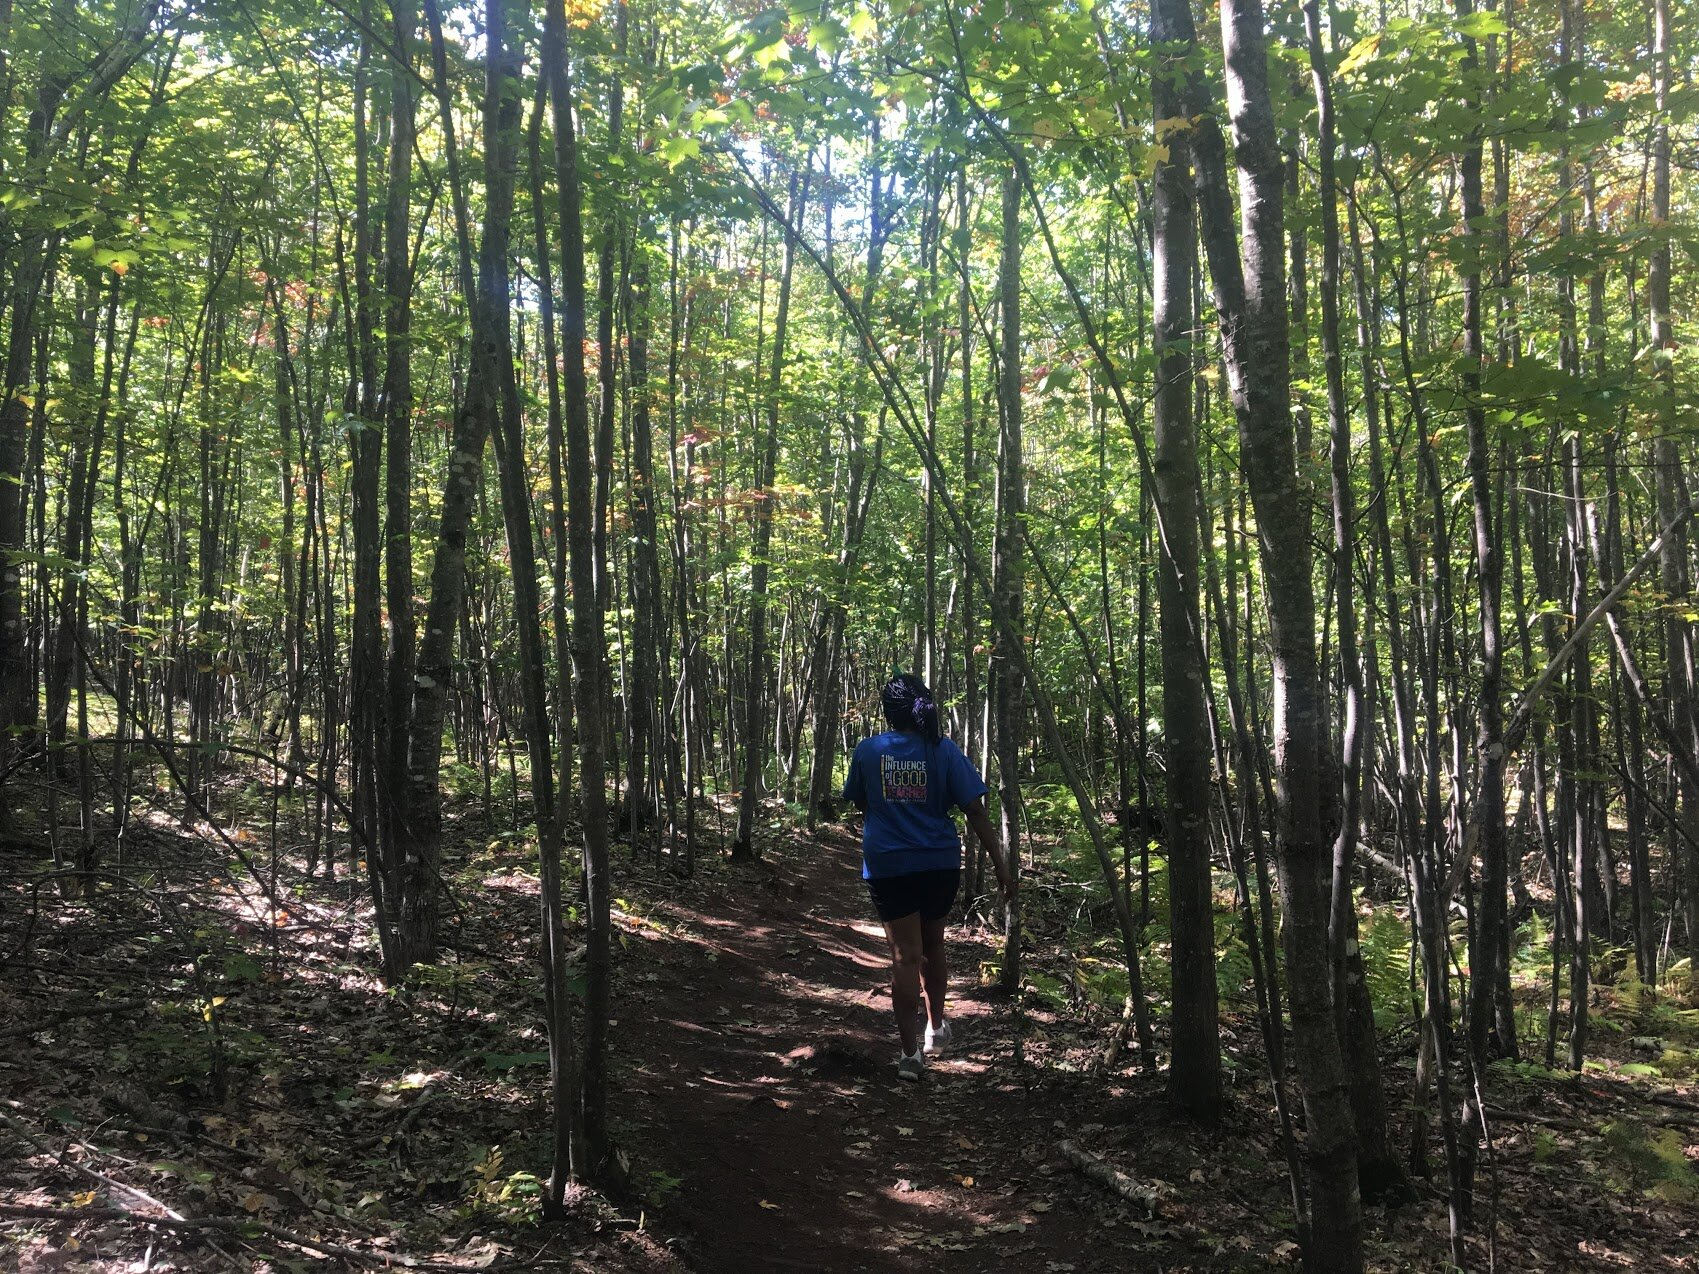 blue-job-mountain-birch-trees.JPG